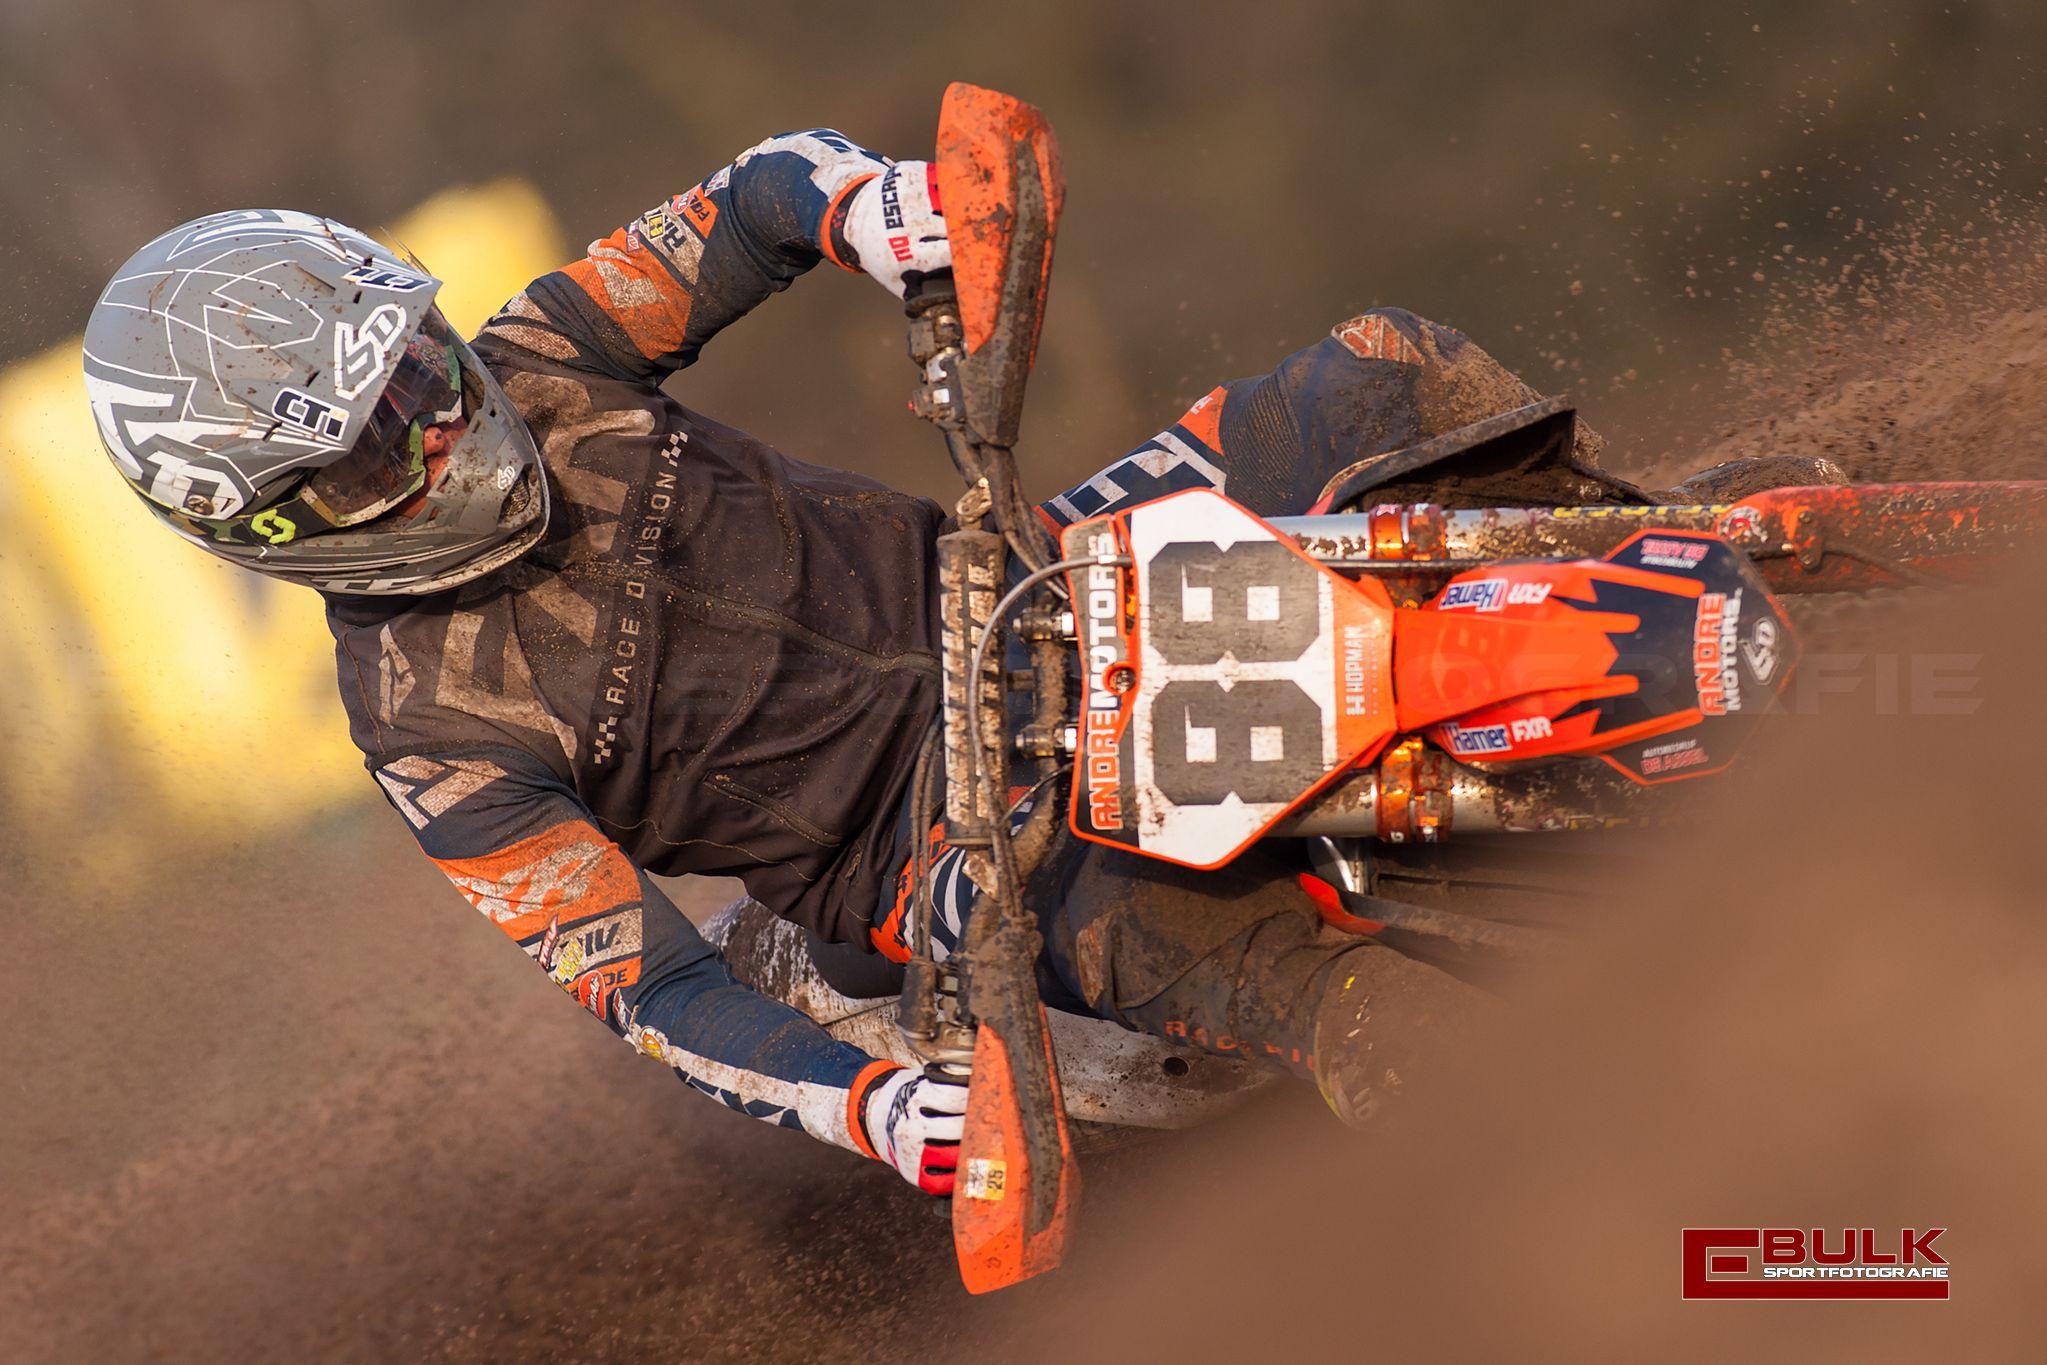 ebs_1734-ed_bulk_sportfotografie